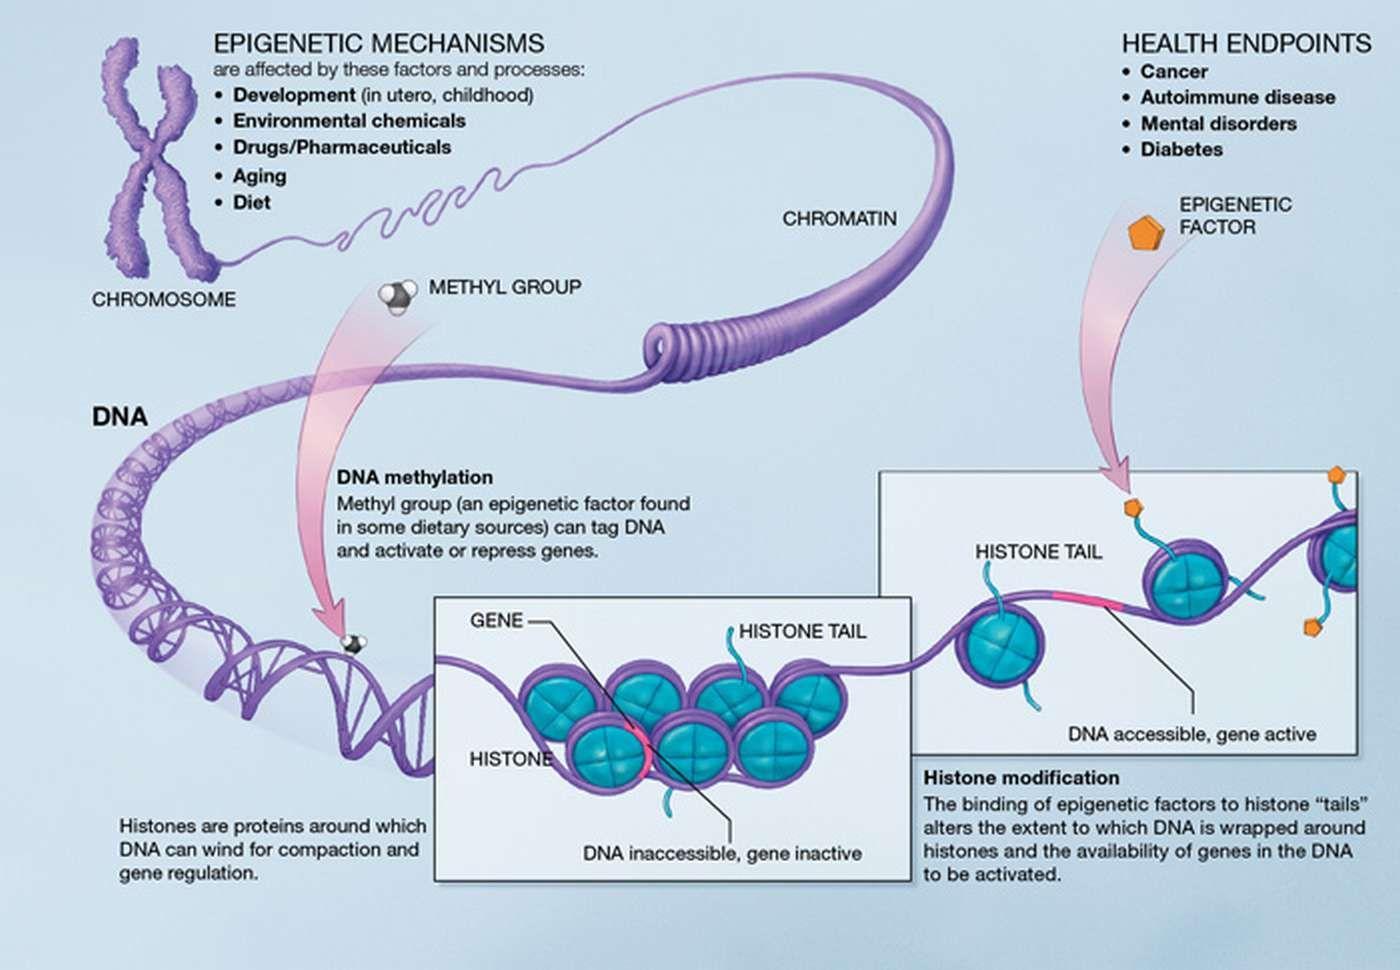 epigenetic-mechanisms